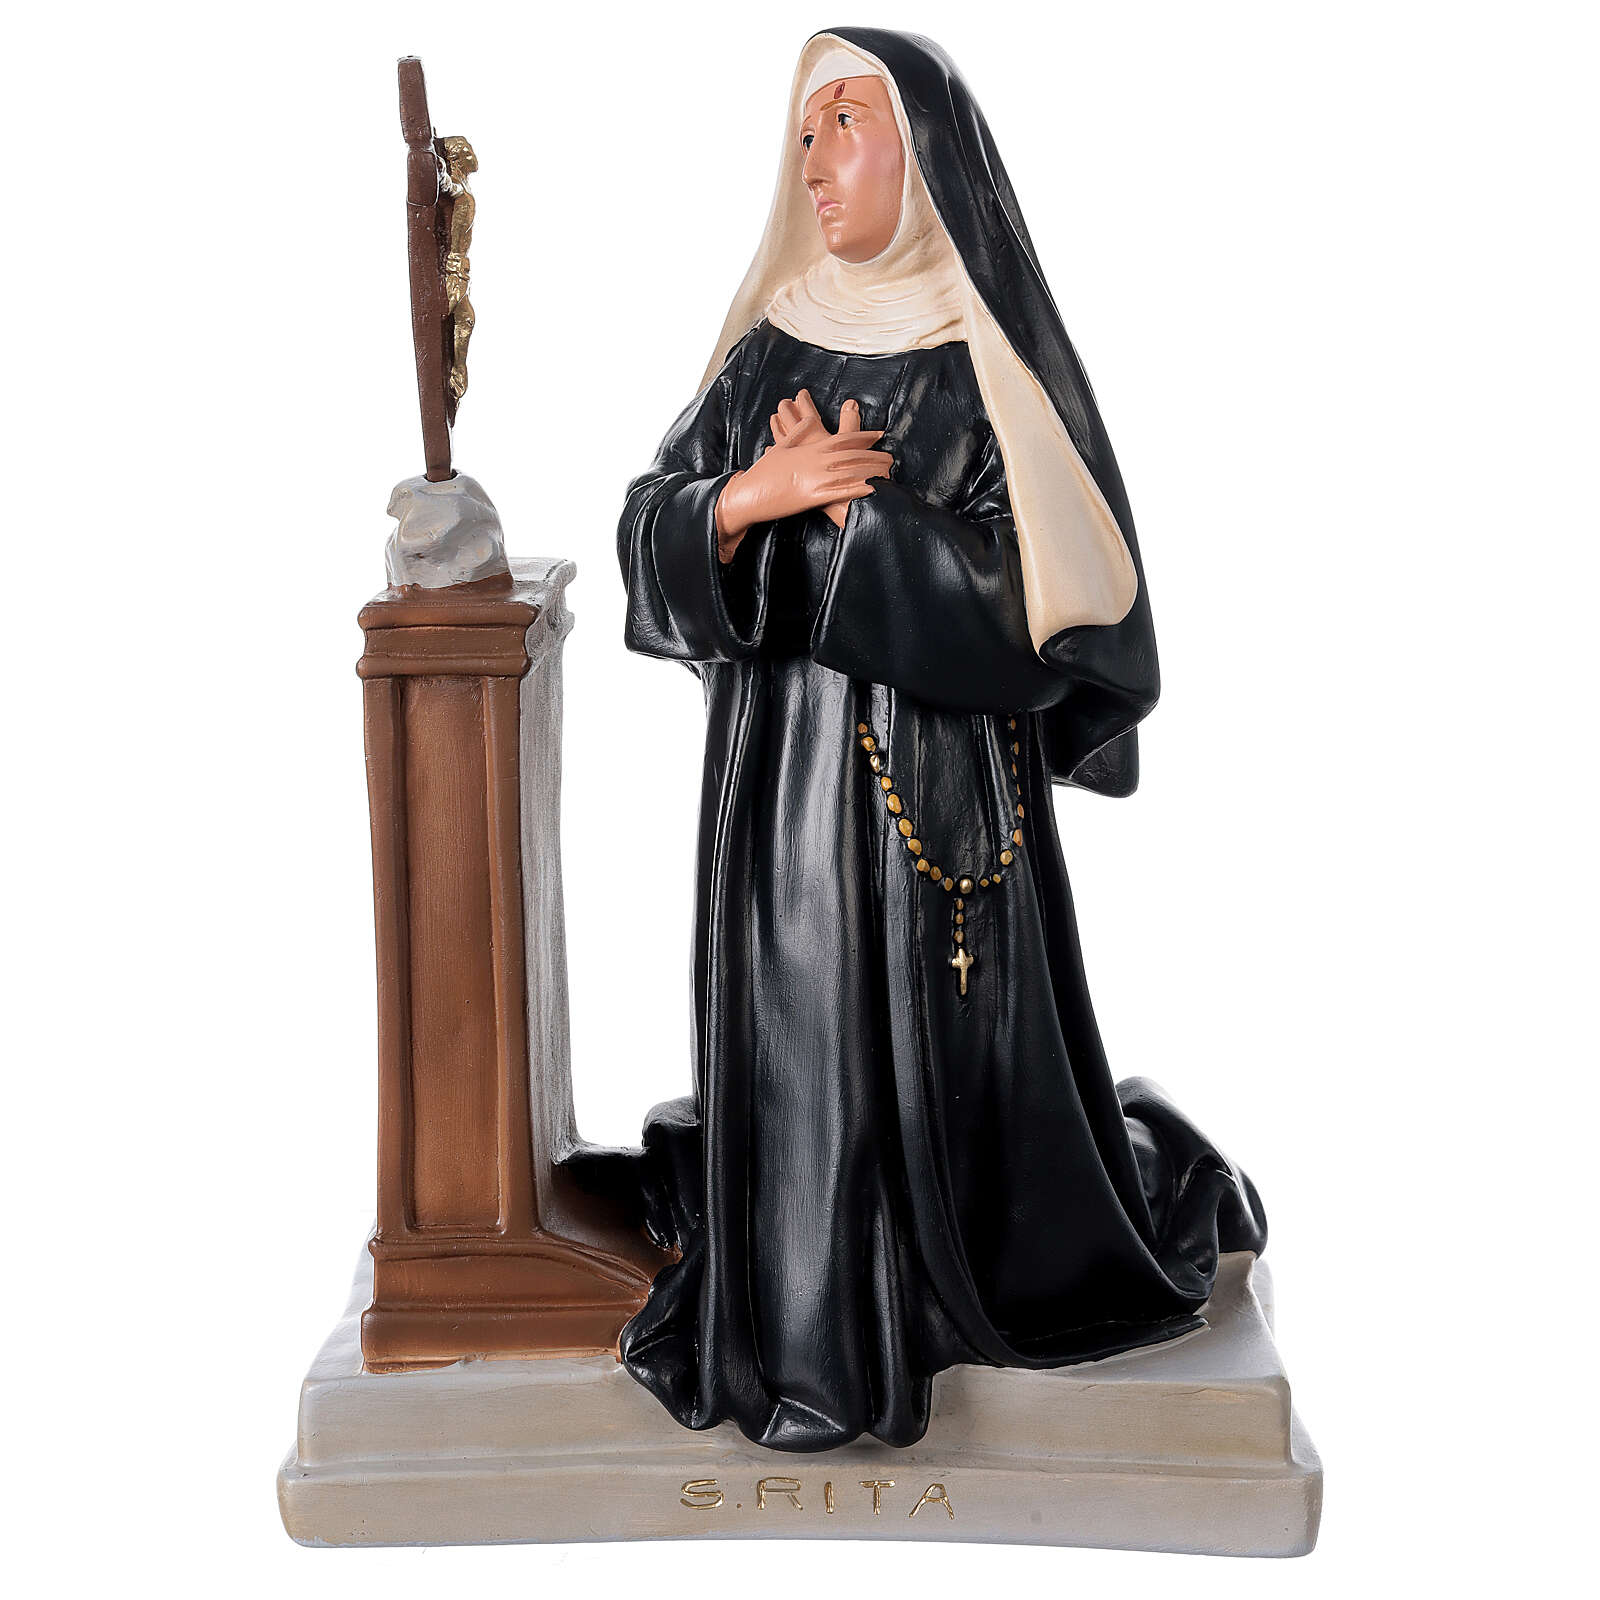 Statue Sainte Rita Cascia agenouillée 40x28 cm plâtre Arte Barsanti 4